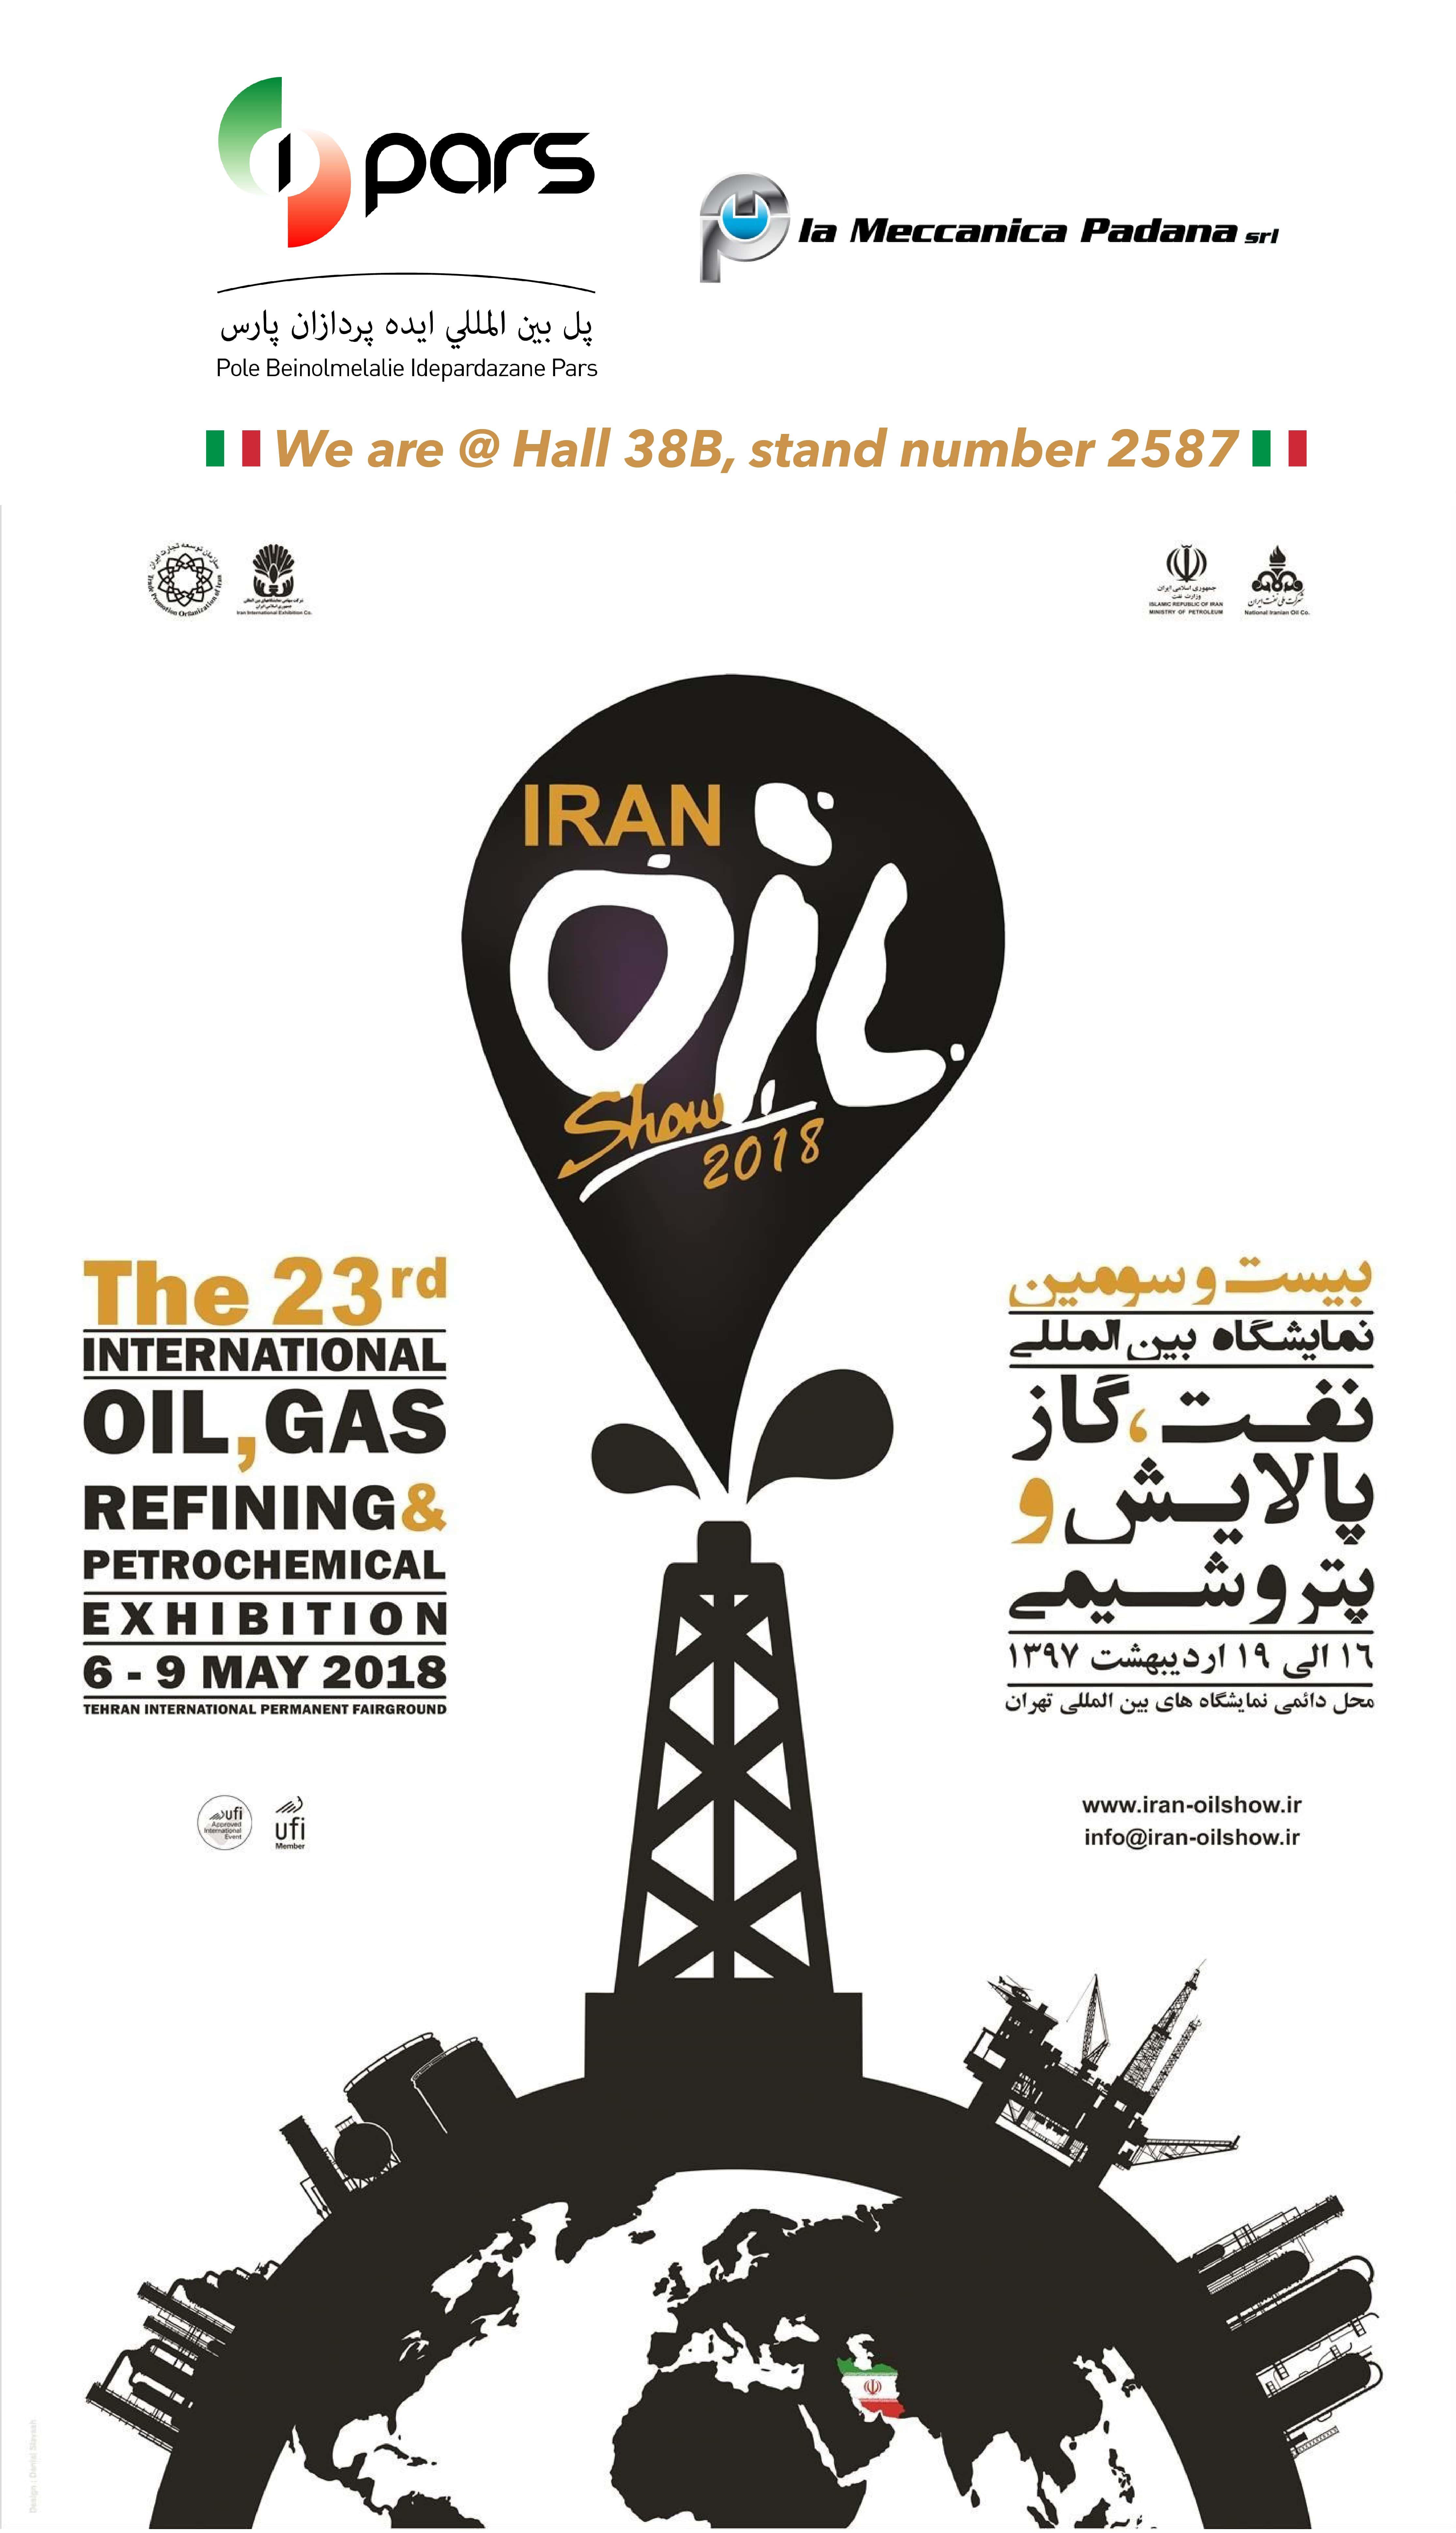 Iran Oil Show I-Pars La Meccanica Padana